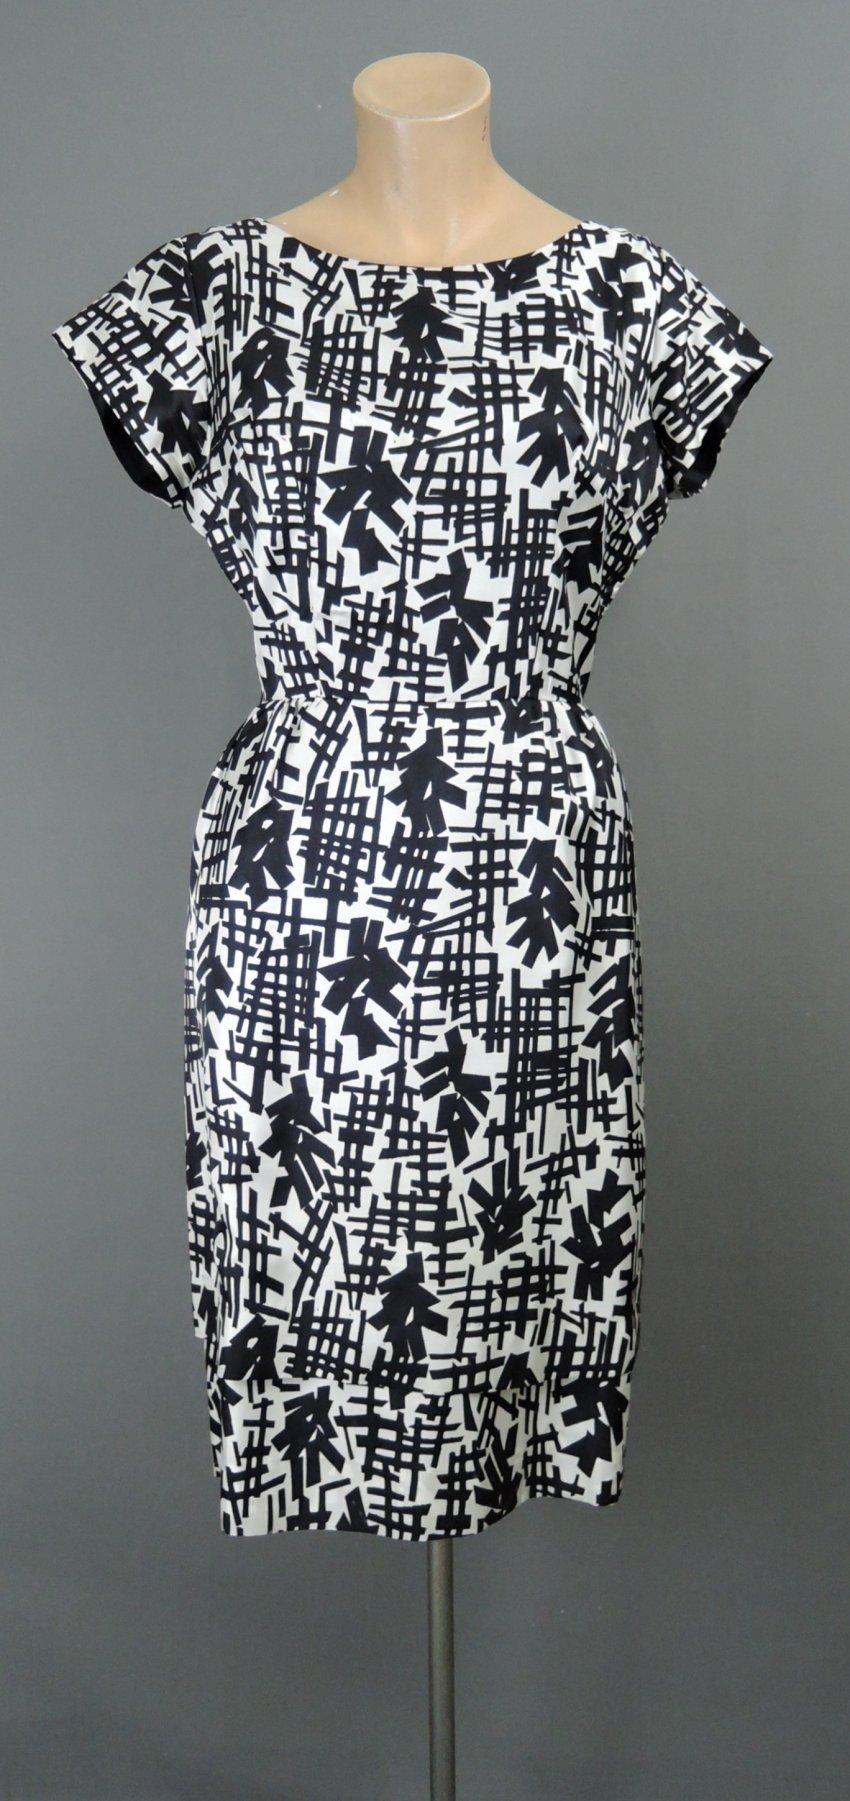 Vintage 1950s Dress Black & White, 36 bust, Double Skirt Silky